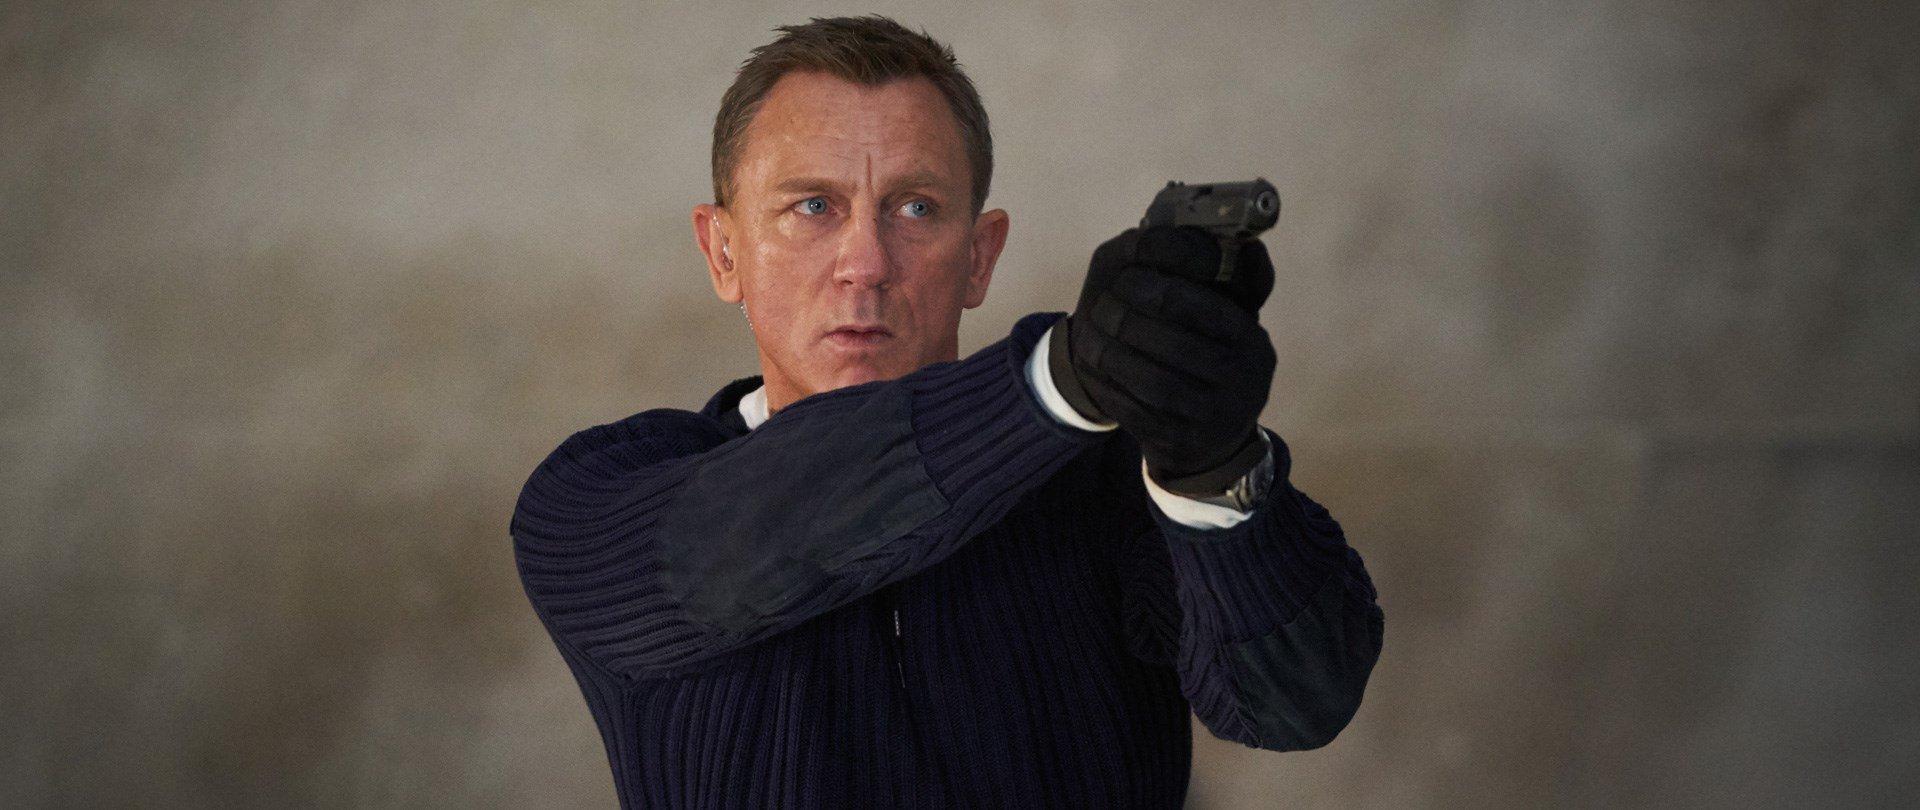 James Bond 007: No Time to Die